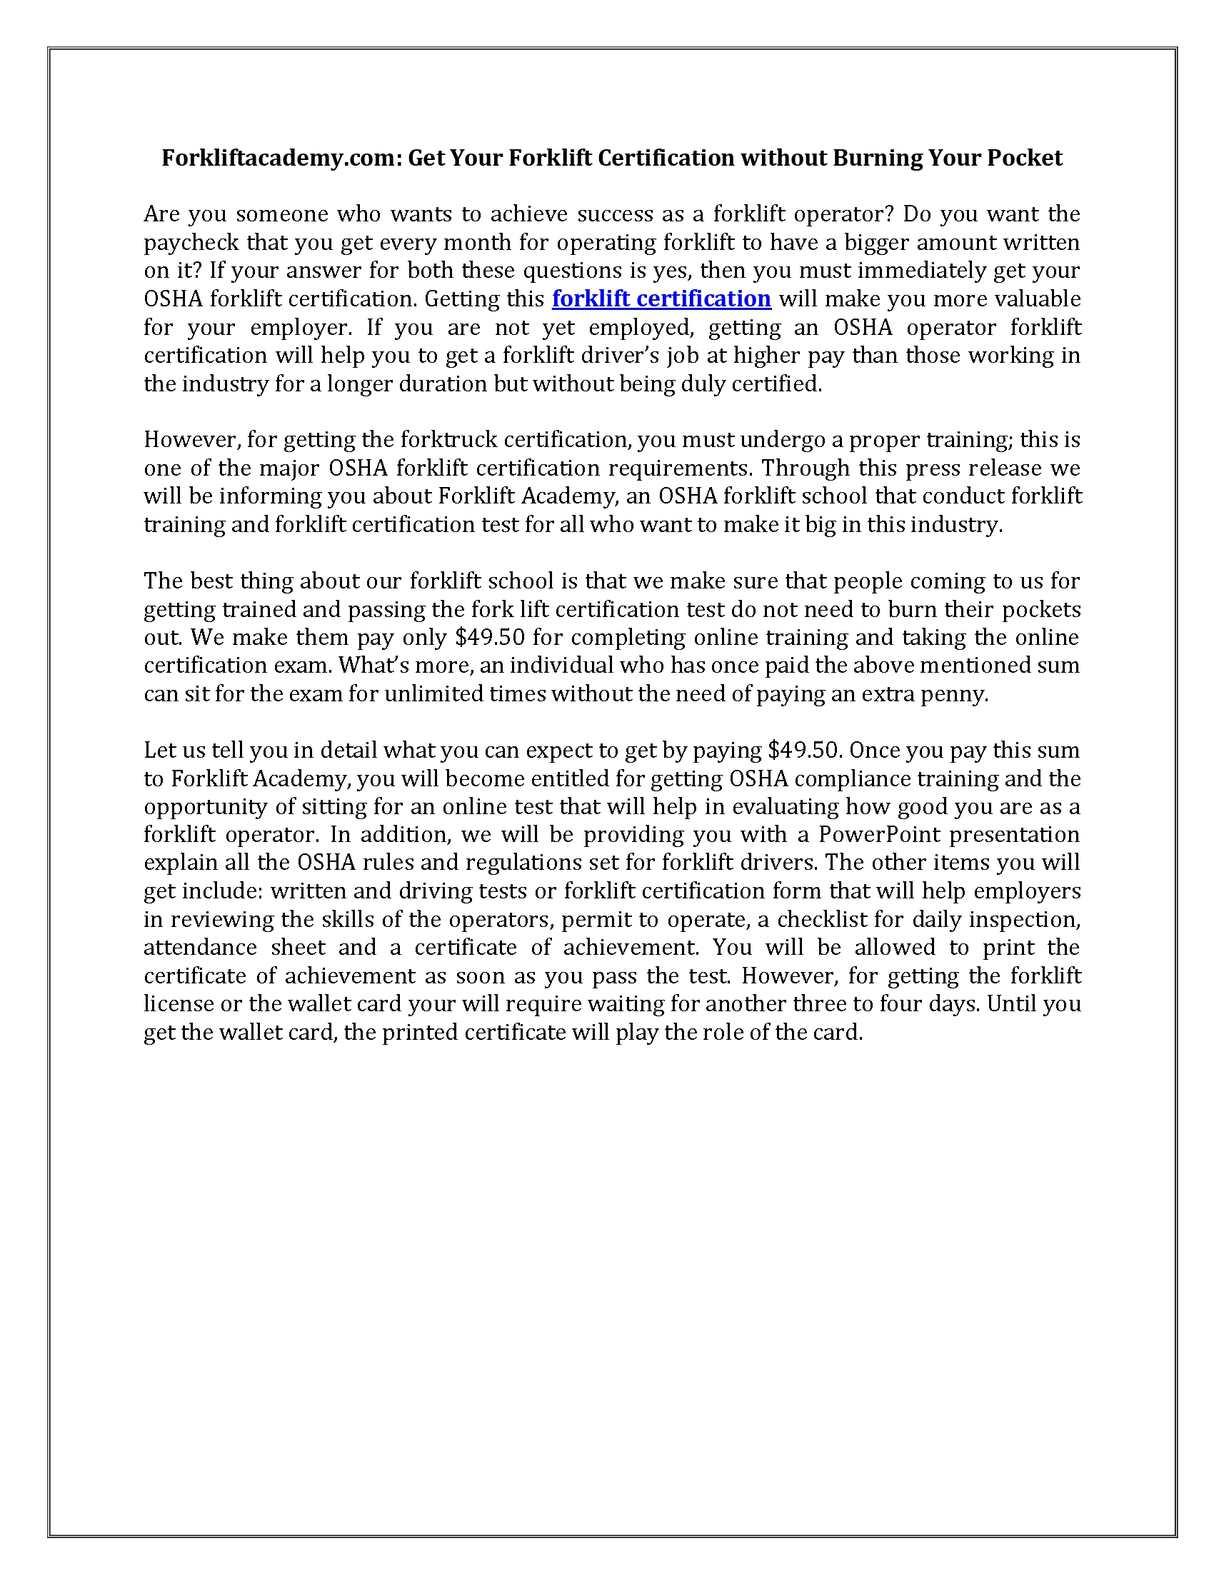 Calamo Osha Forklift Certification